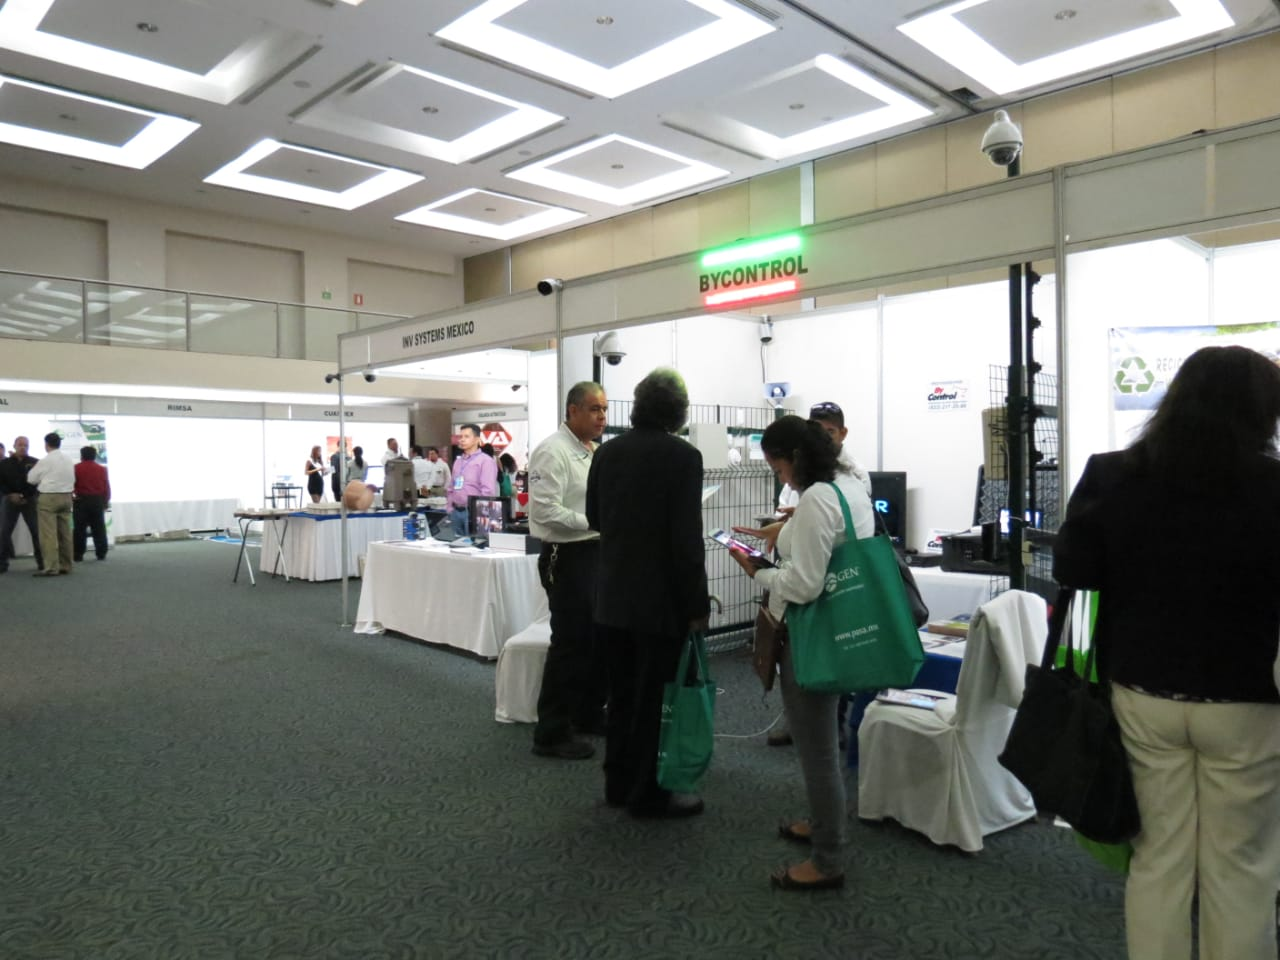 Recibió Tampico 20 congresos en 2018